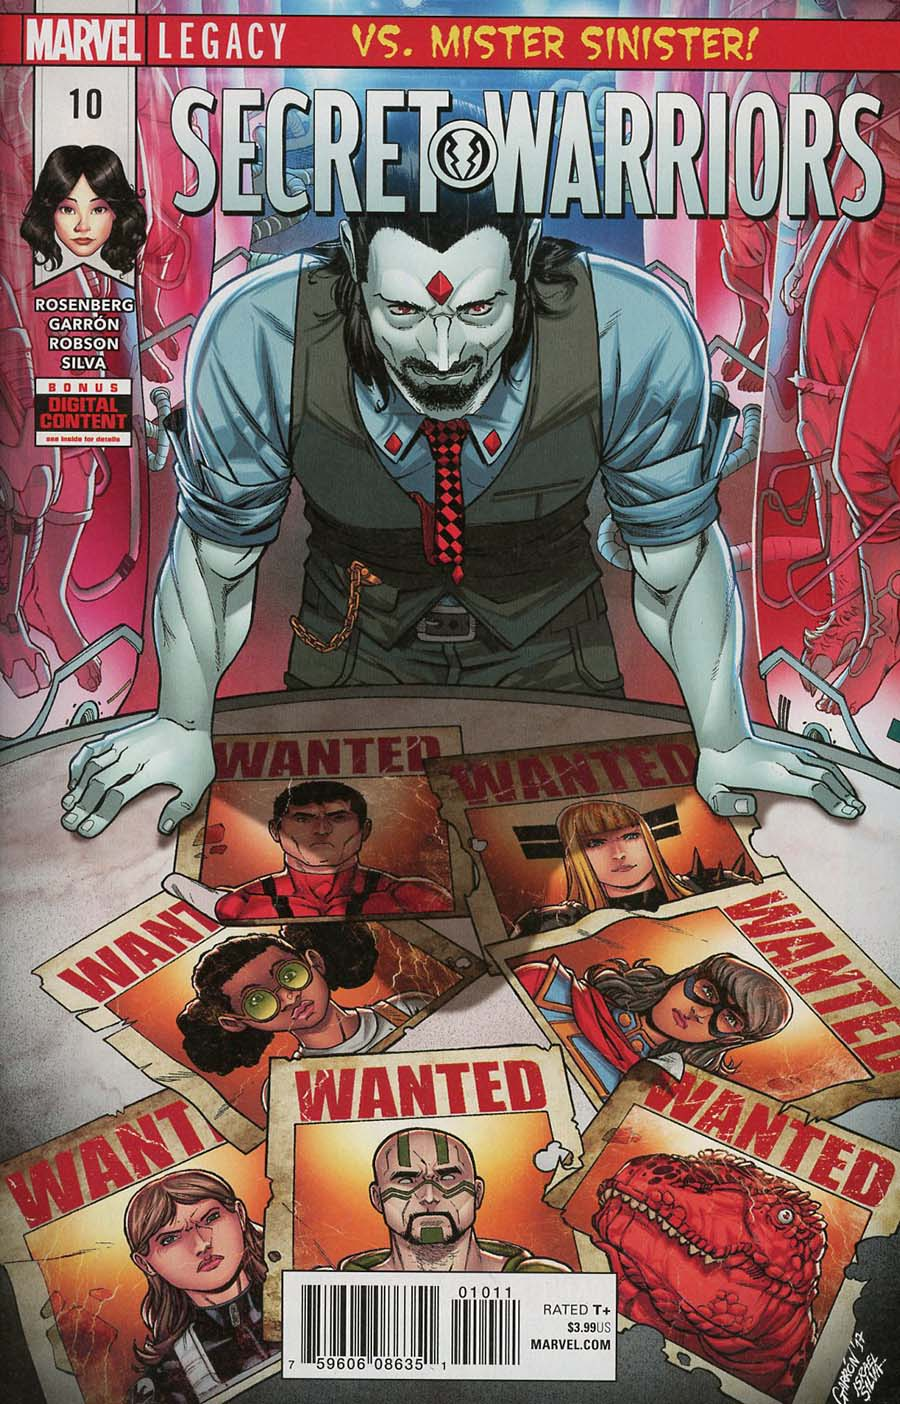 Secret Warriors Vol 2 #10 (Marvel Legacy Tie-In)